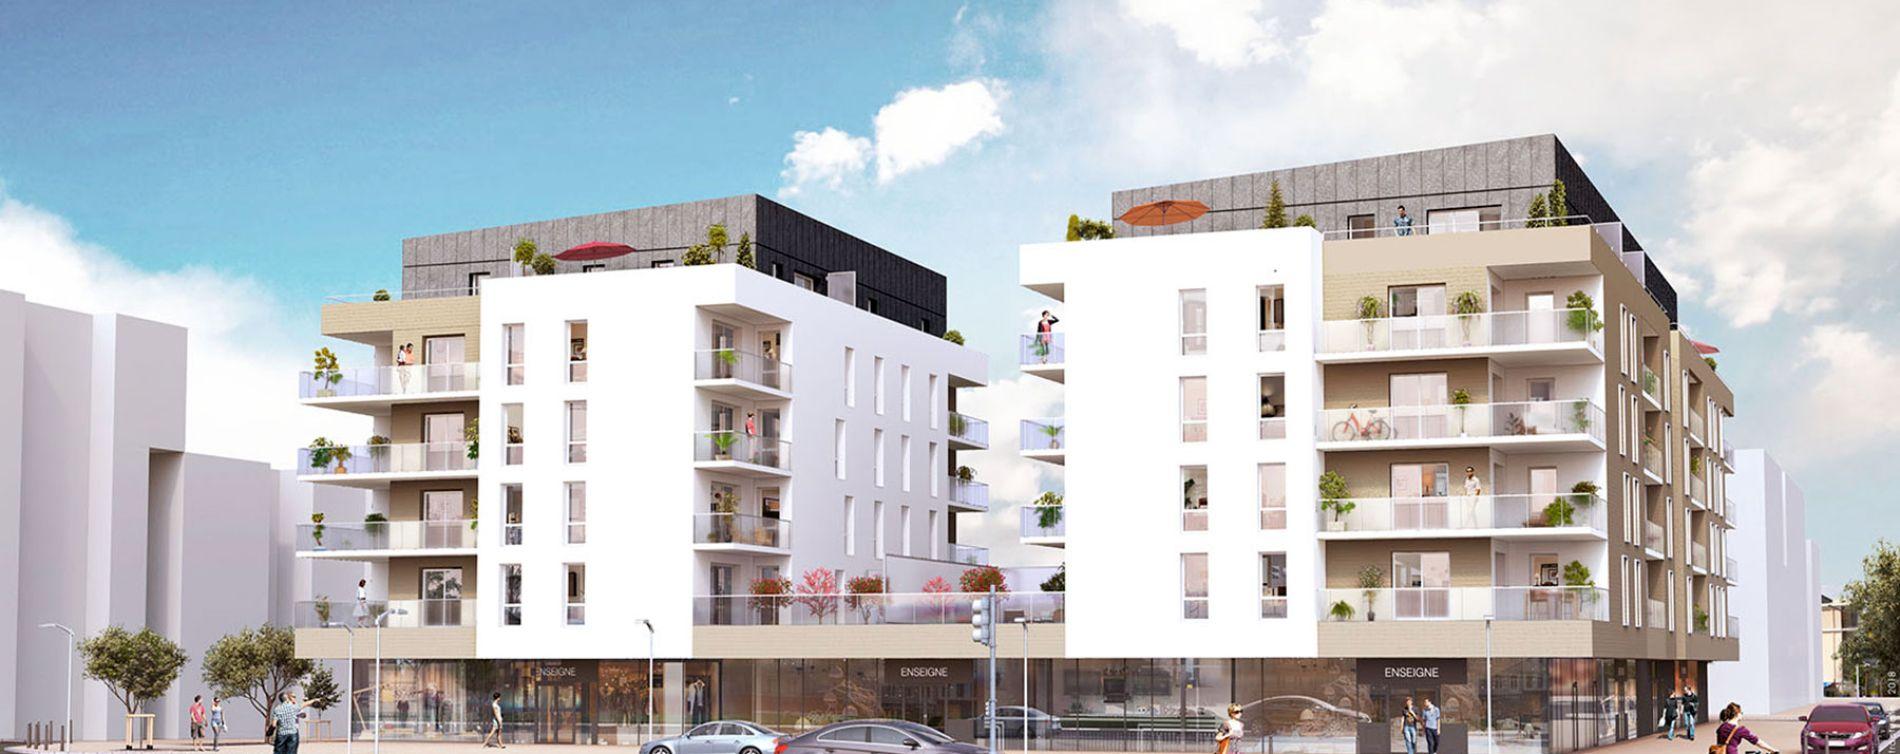 Résidence In City à Caen